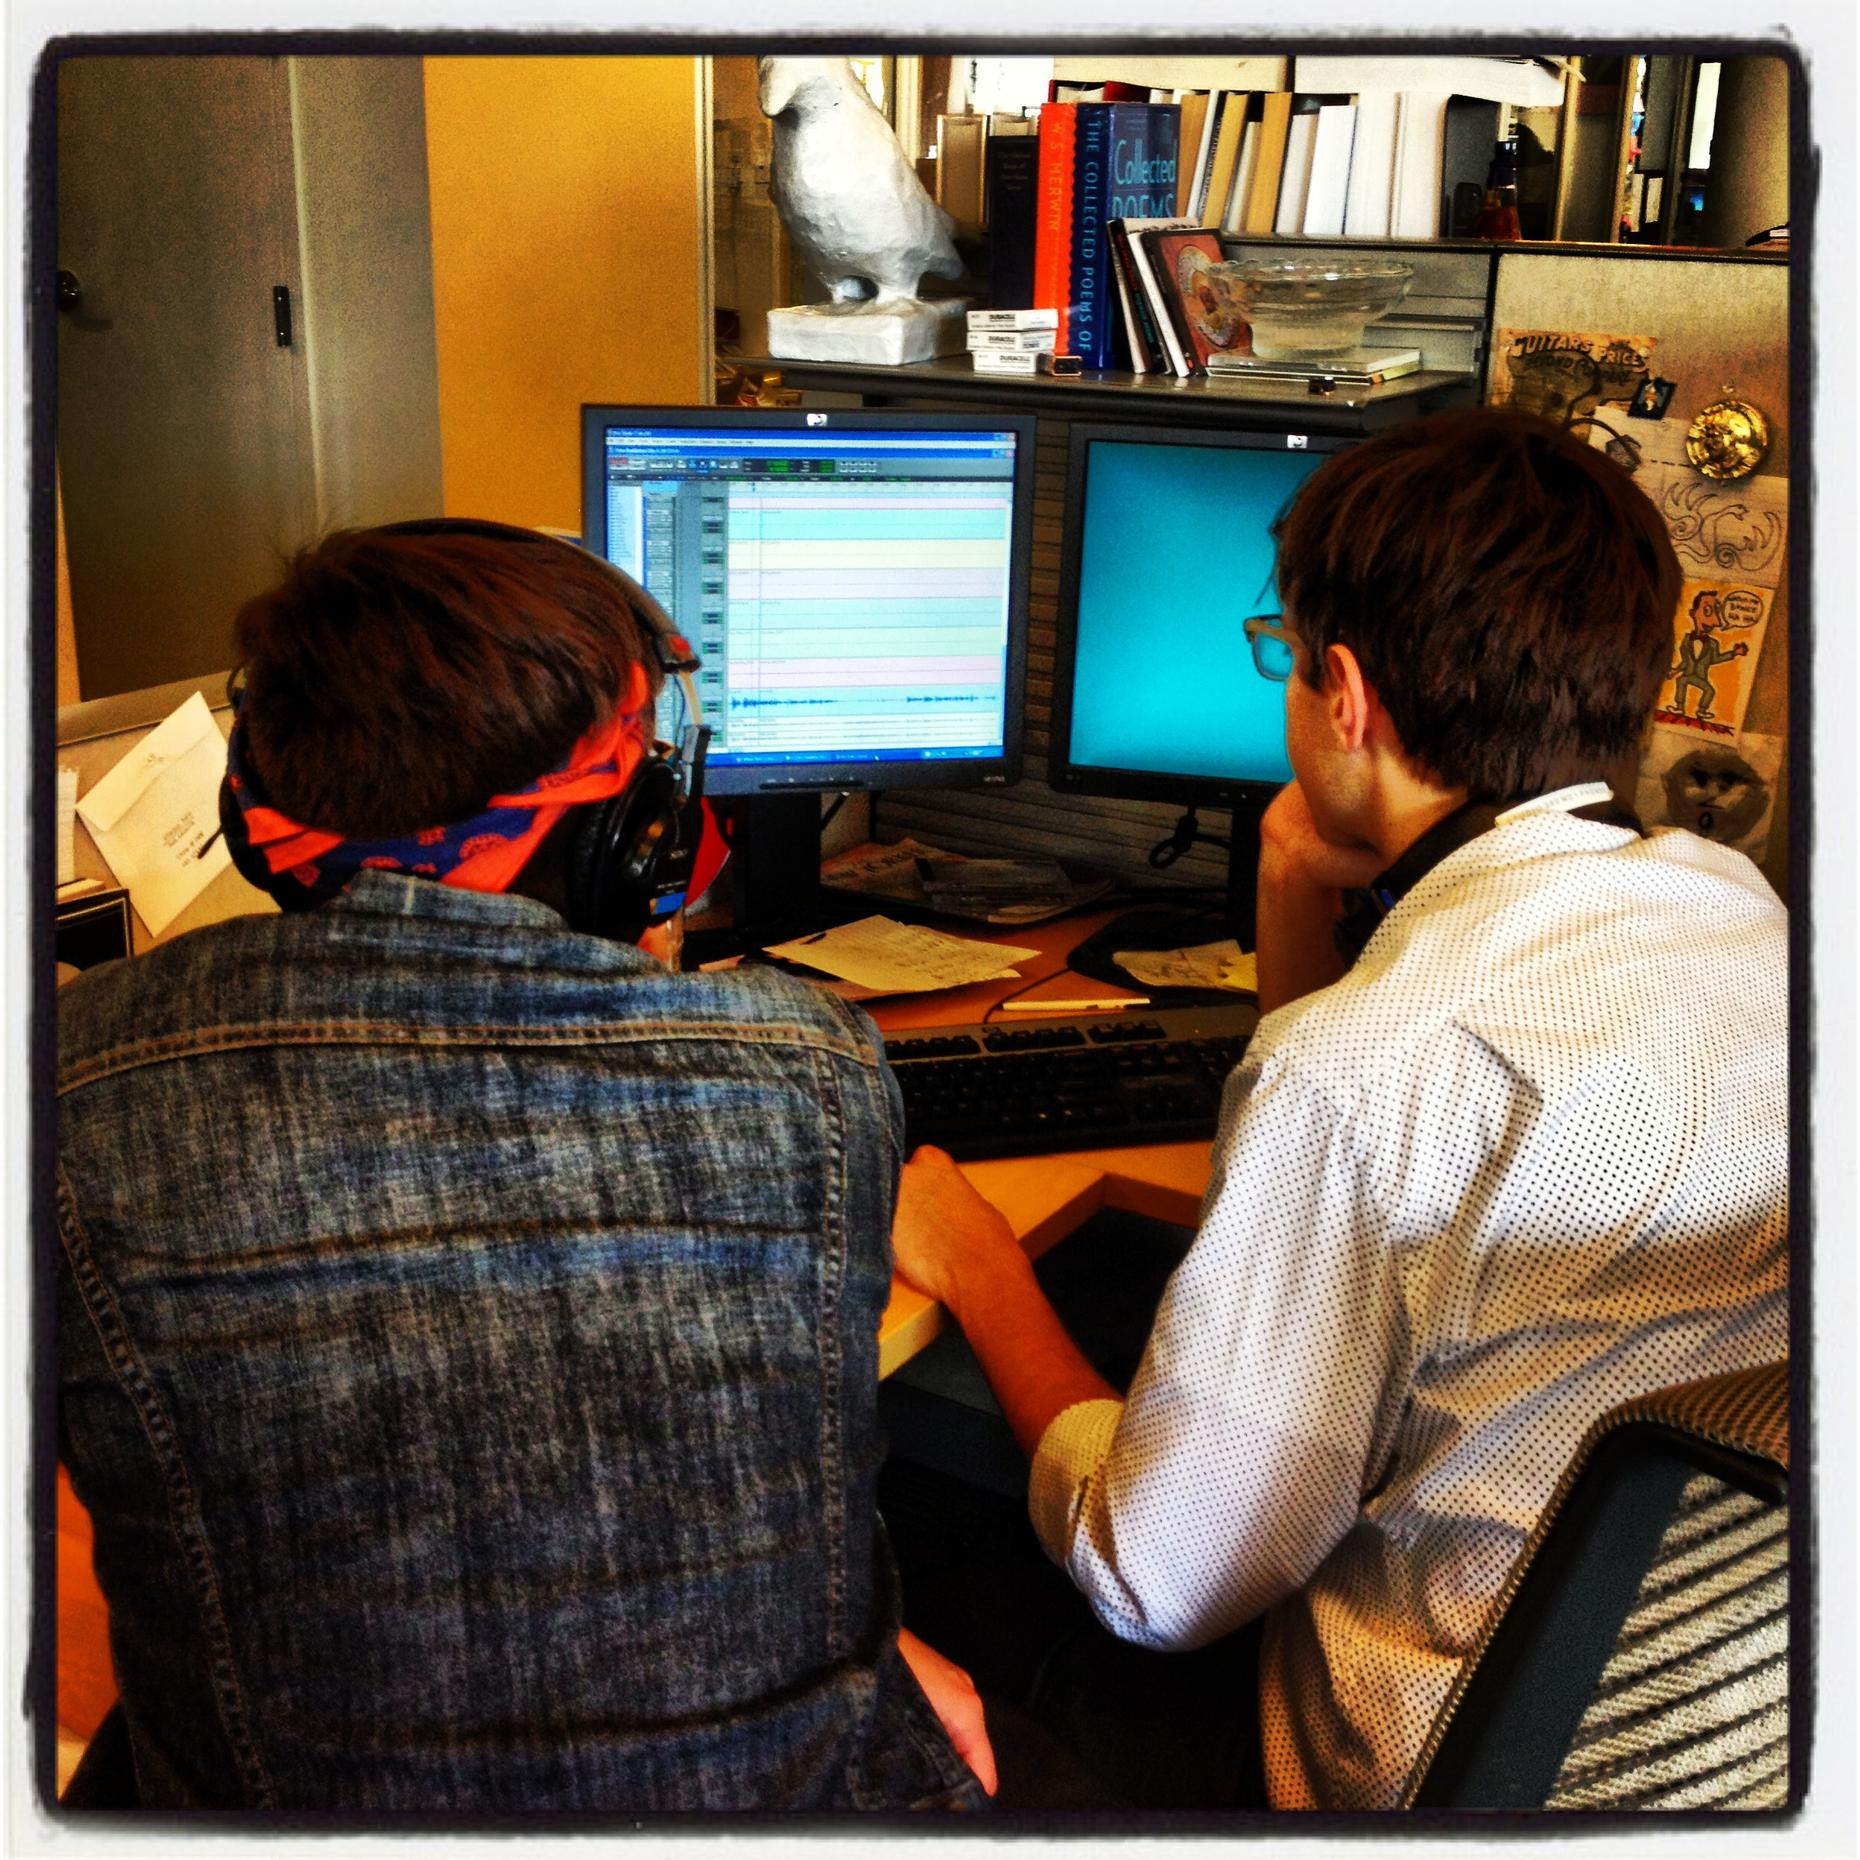 Studio 360 interns in action